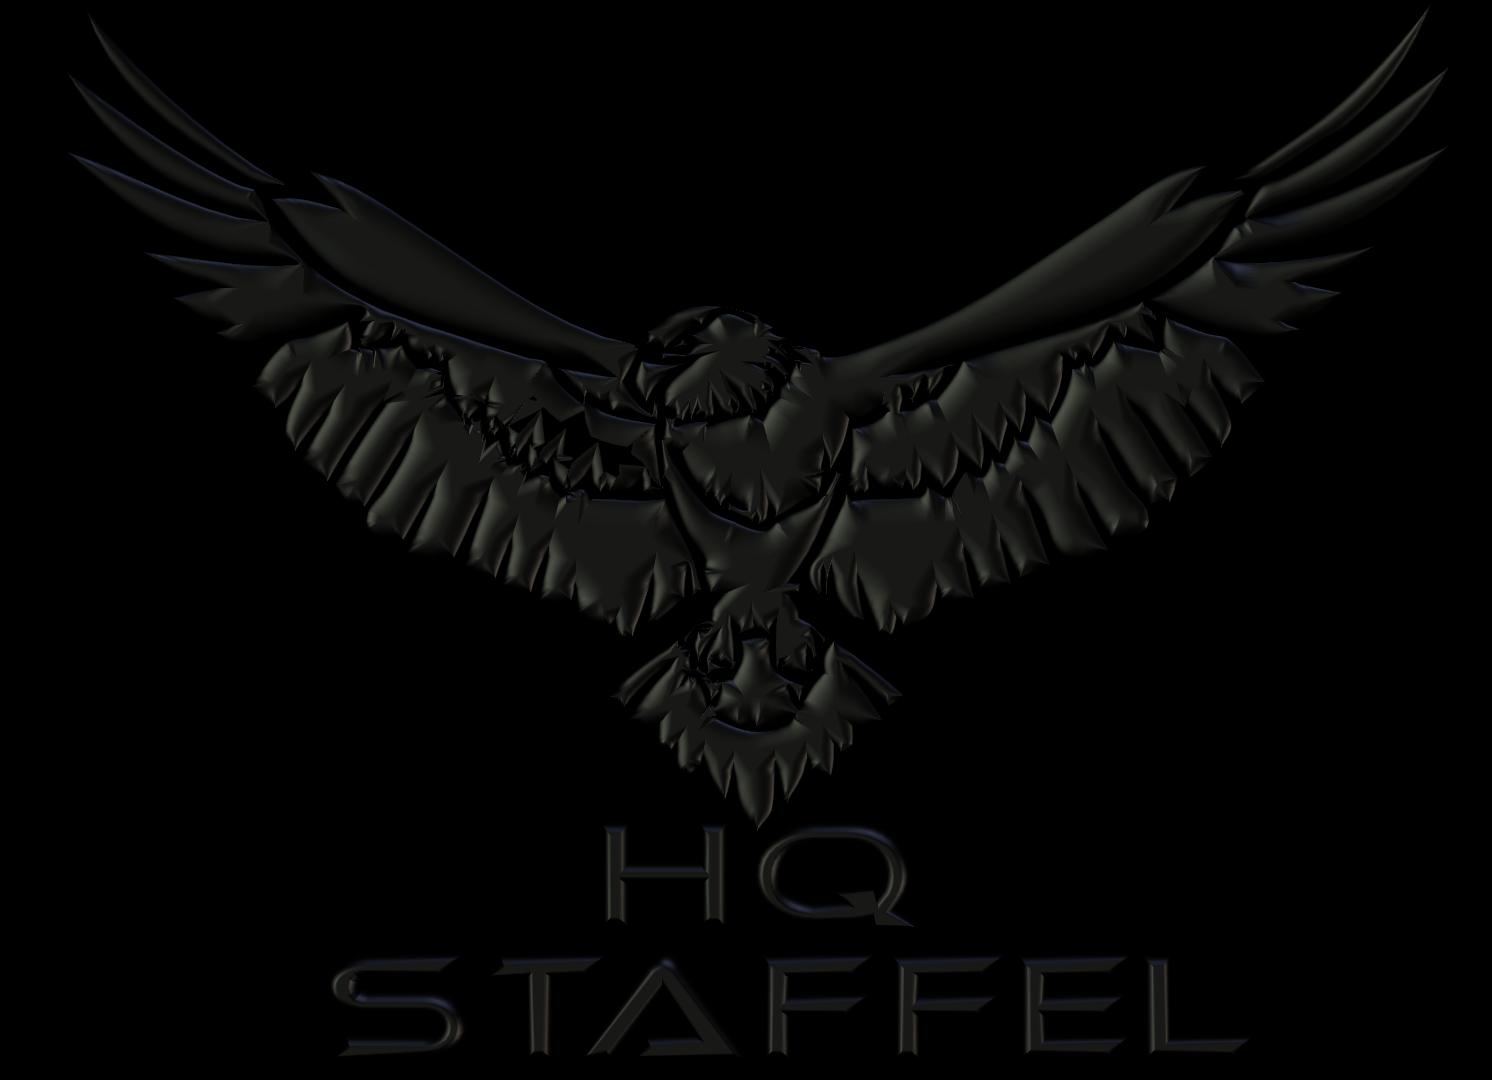 HQ-Staffel-Logo_Adler_02_Obsidian_01.png